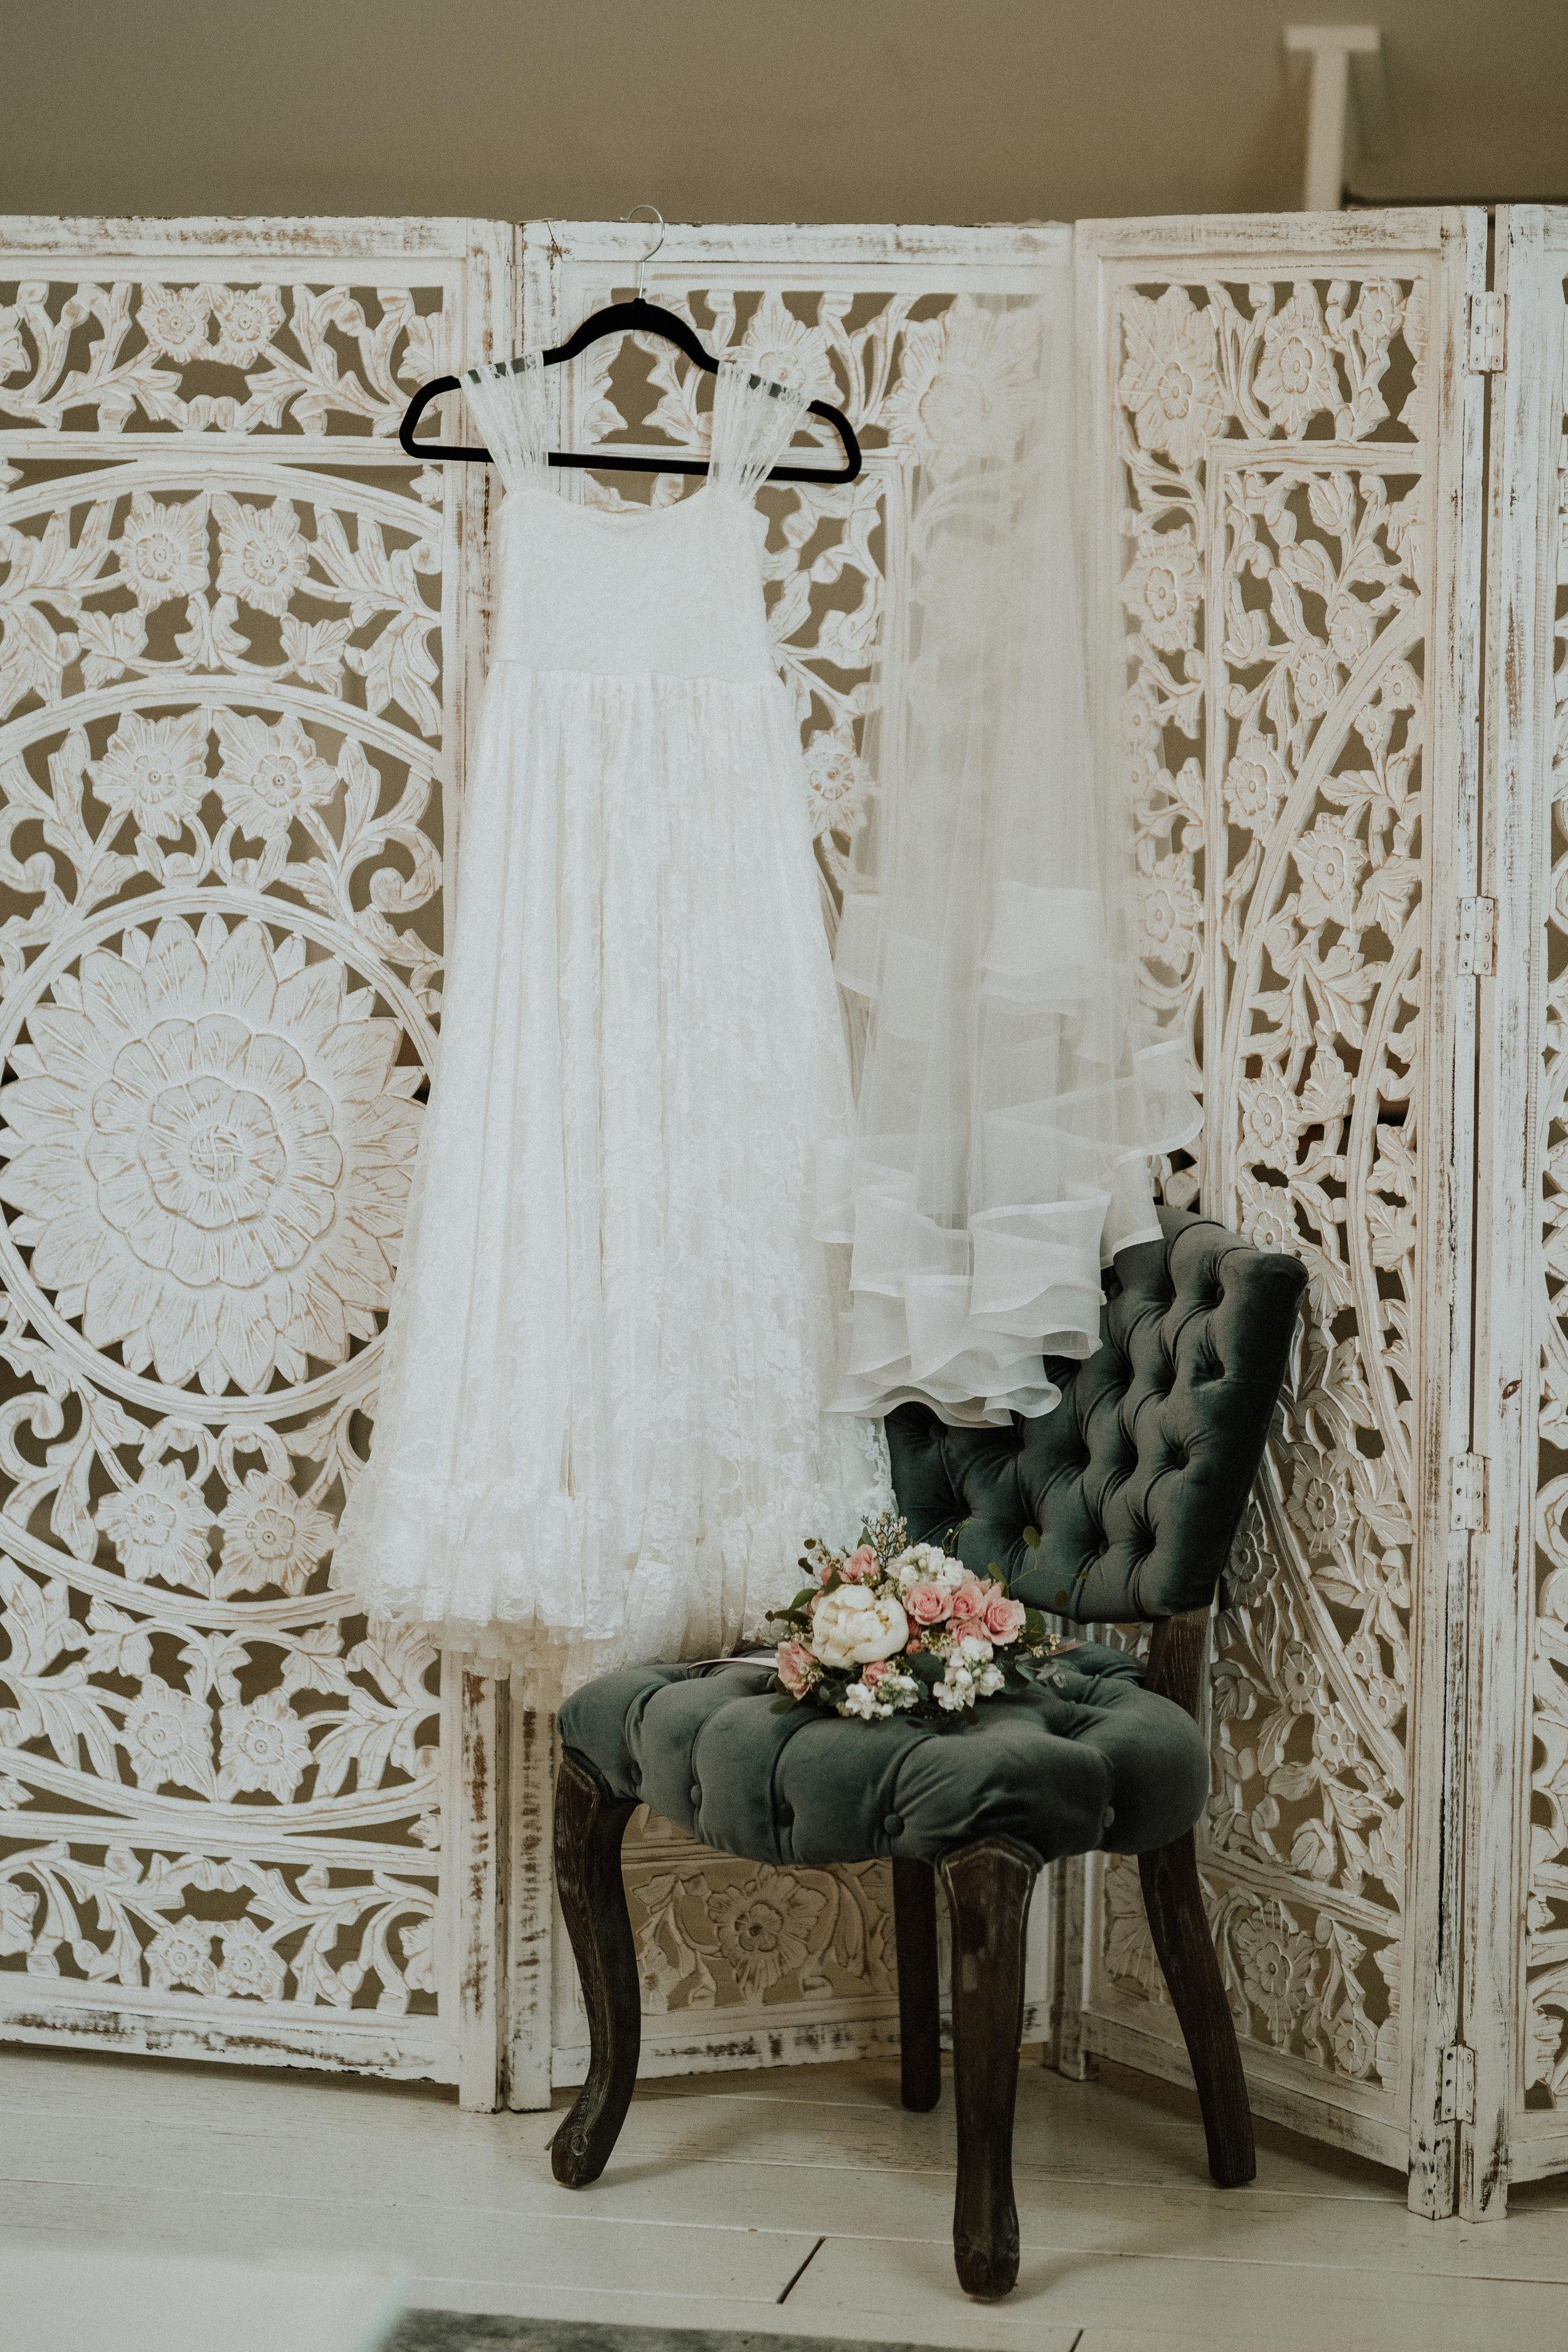 This gorgeous Bridal Suite is found at Ramble Creek Vineyard.